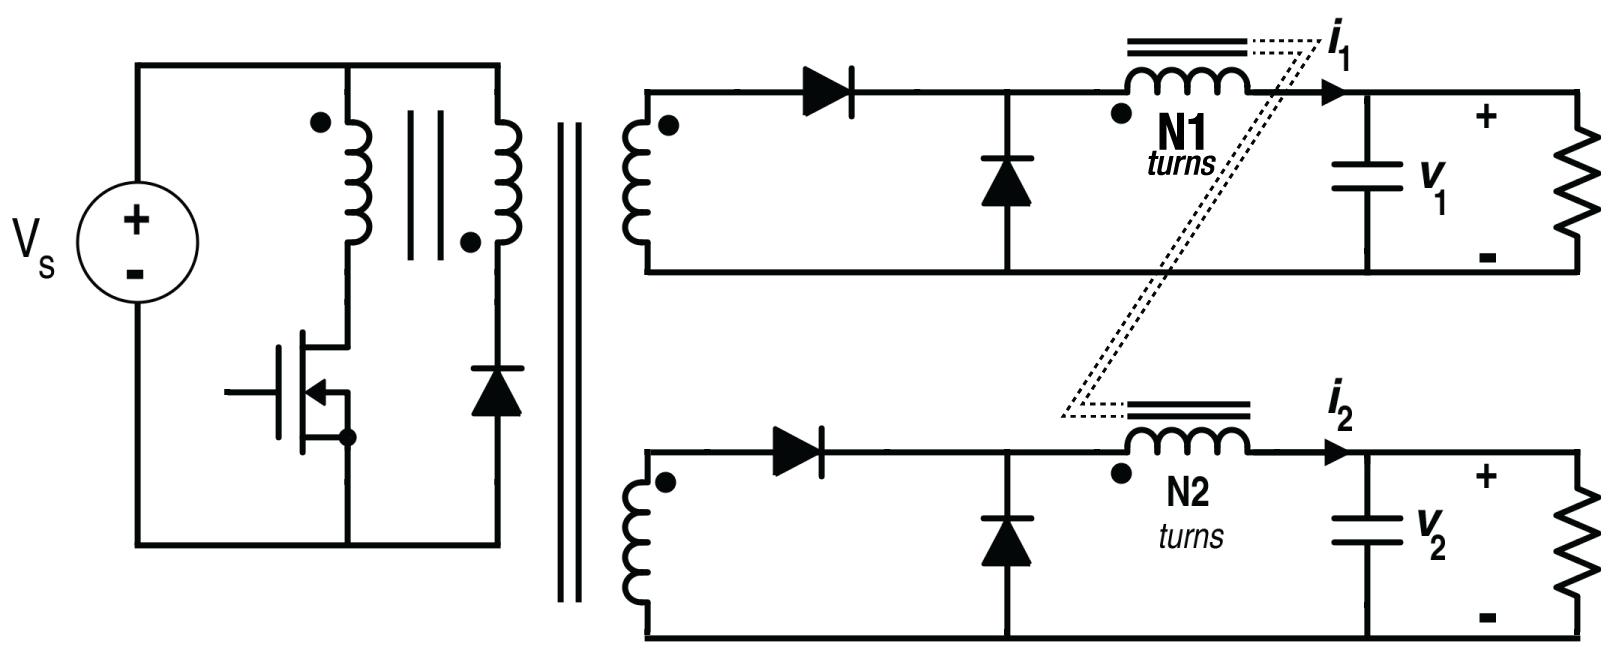 Understanding Inductor Designs for Converters